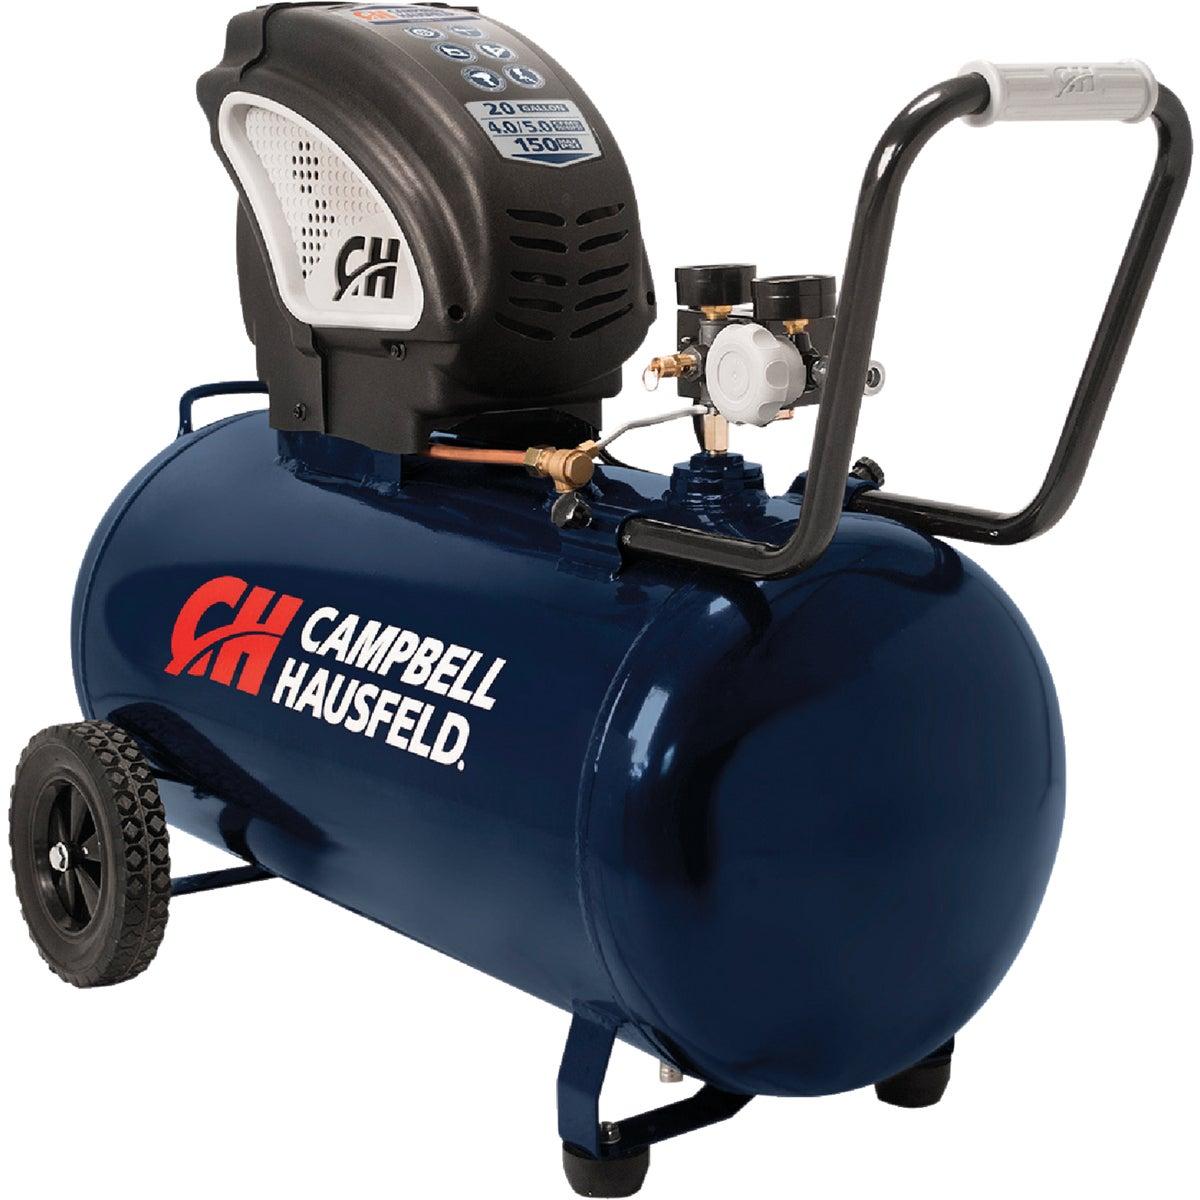 Campbell Hausfeld 20 Gal. 1.7 HP Air Compressor